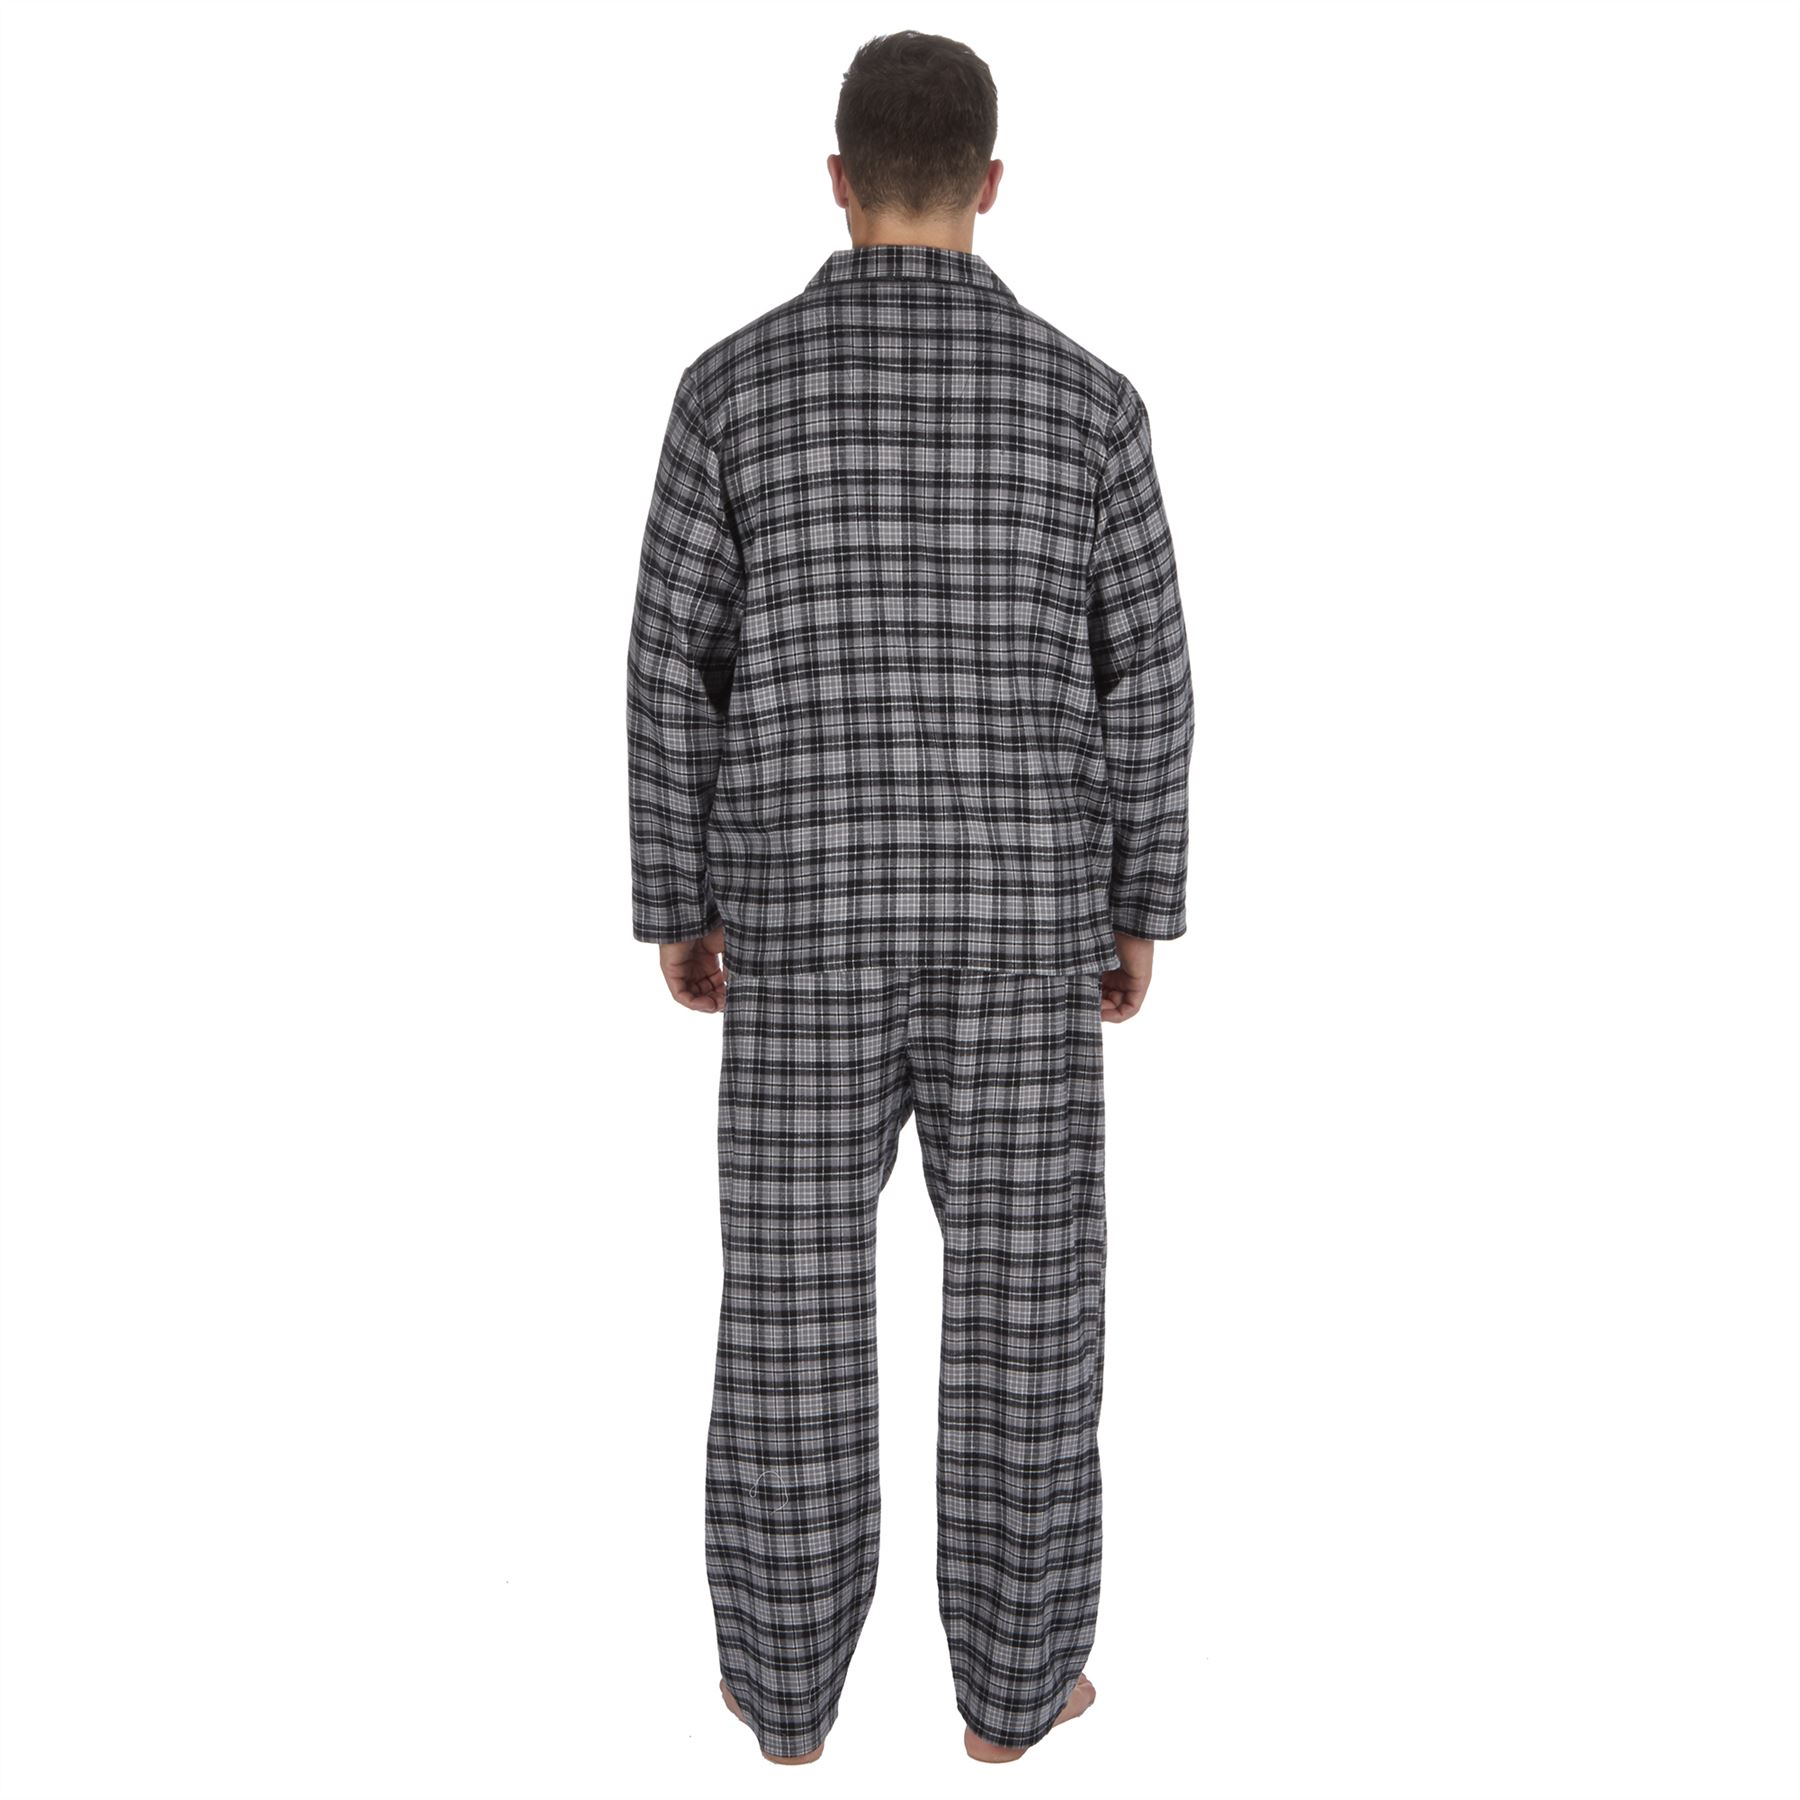 thumbnail 6 - Mens-Boys-100-Cotton-Flannel-Long-Sleeved-Pyjamas-Pyjama-Set-Check-Size-M-XXL